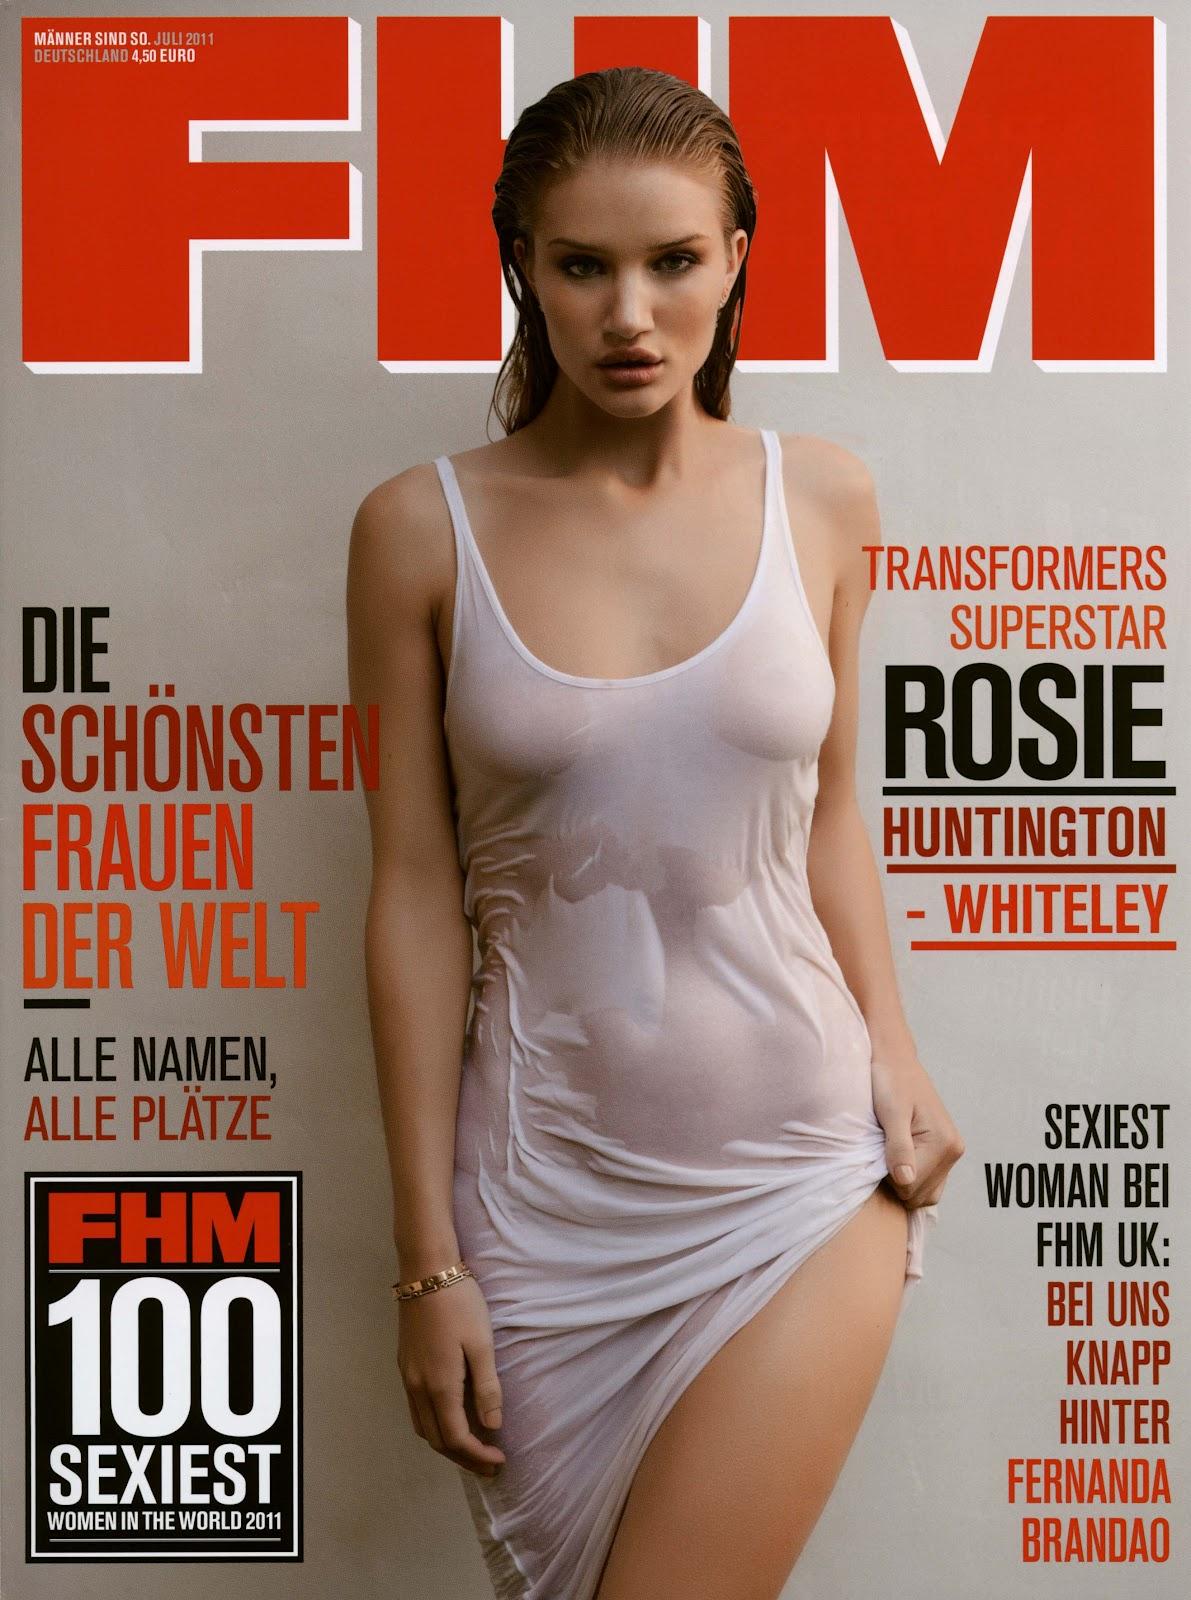 http://4.bp.blogspot.com/-5wMrIEuSFqE/Tzq9oW8jmfI/AAAAAAAAW5k/X1zHxfc1E9Y/s1600/FHM_Top_100_Sexiest_Women_2011_Germany_Scanof.net_01.jpg